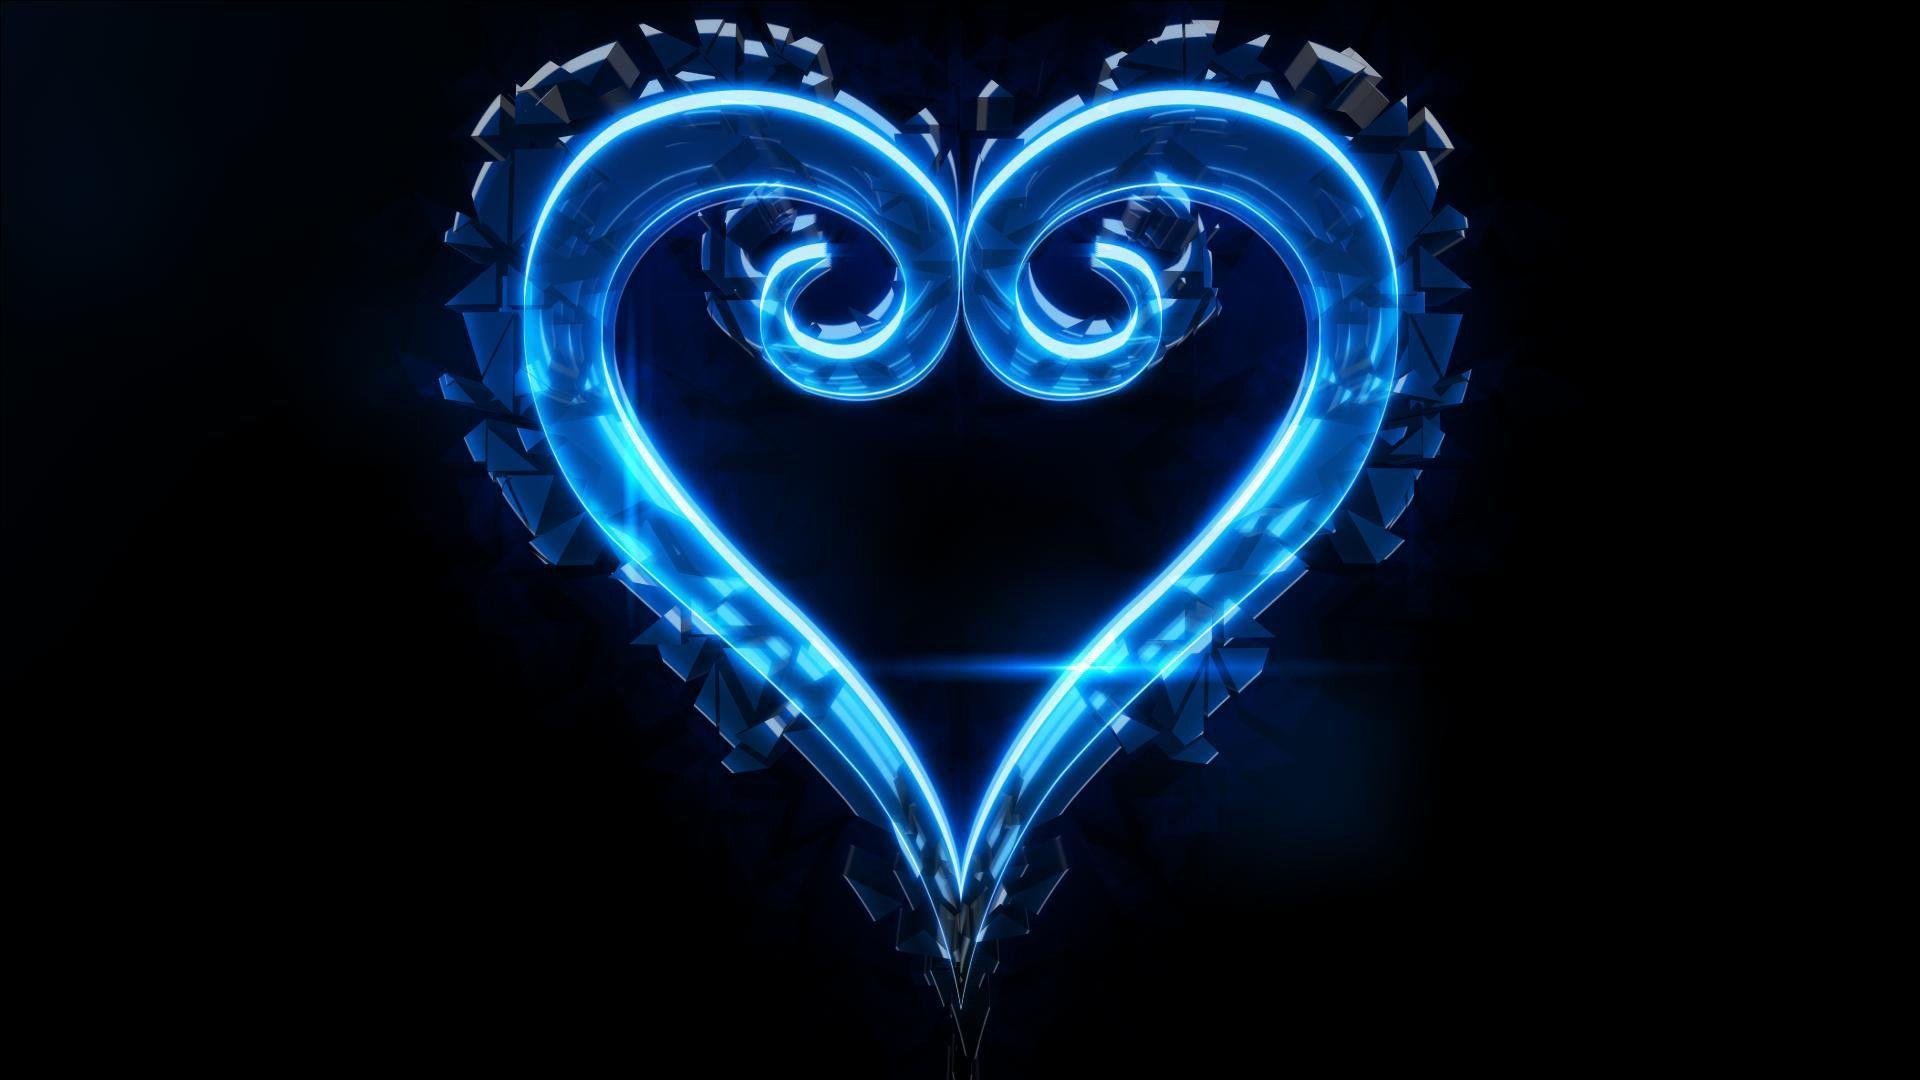 Blue Heart Wallpapers - Wallpaper Cave Blue Heart Wallpapers